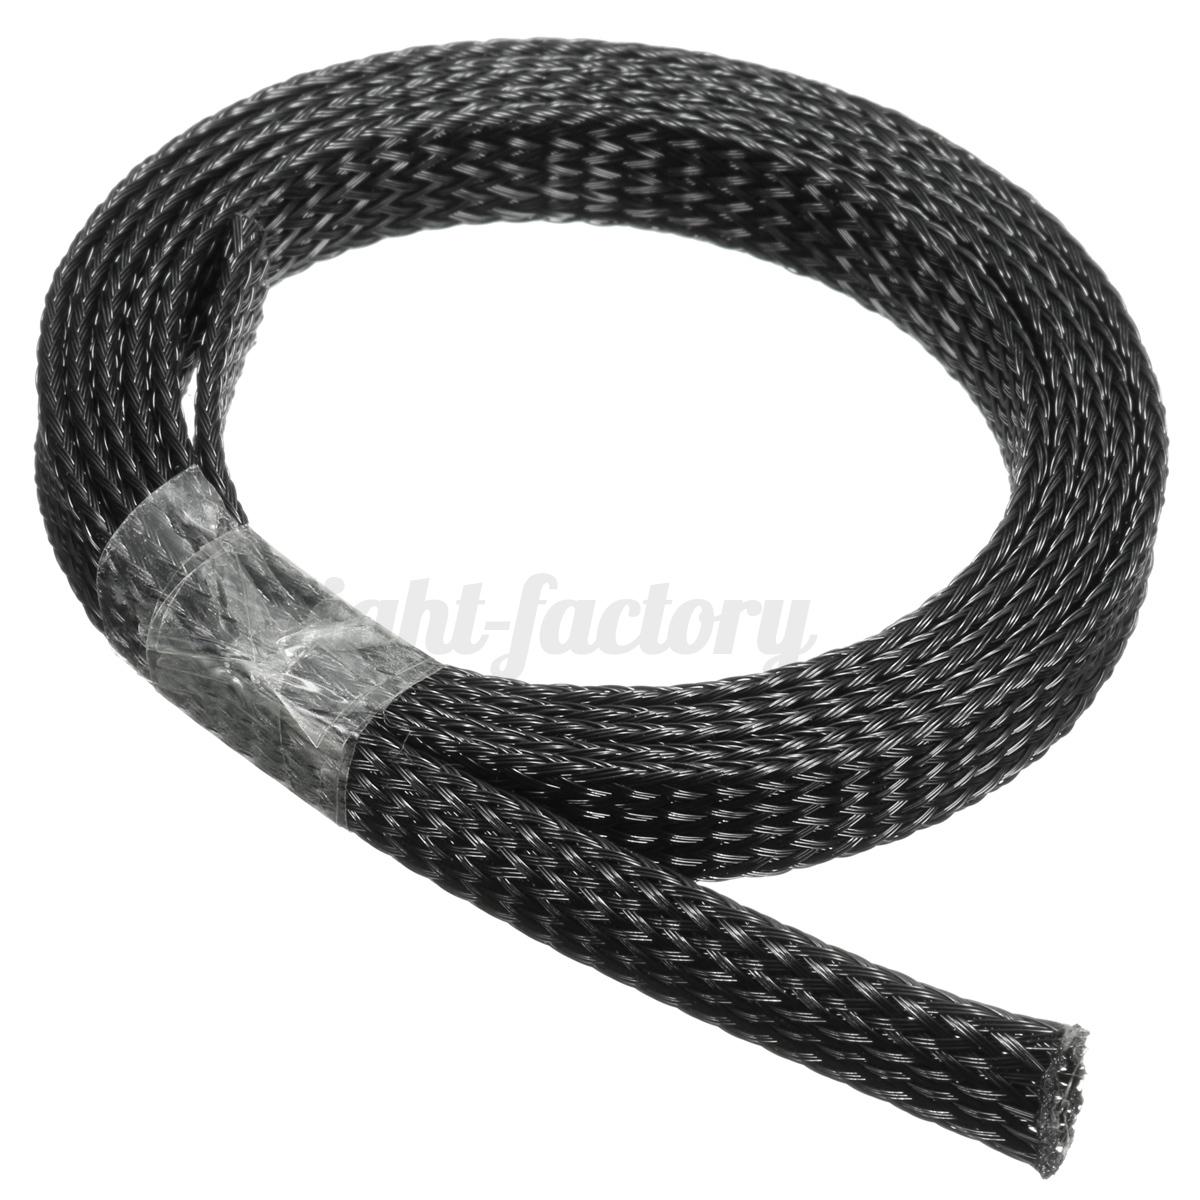 wire harness mesh alternator wire harness wire size